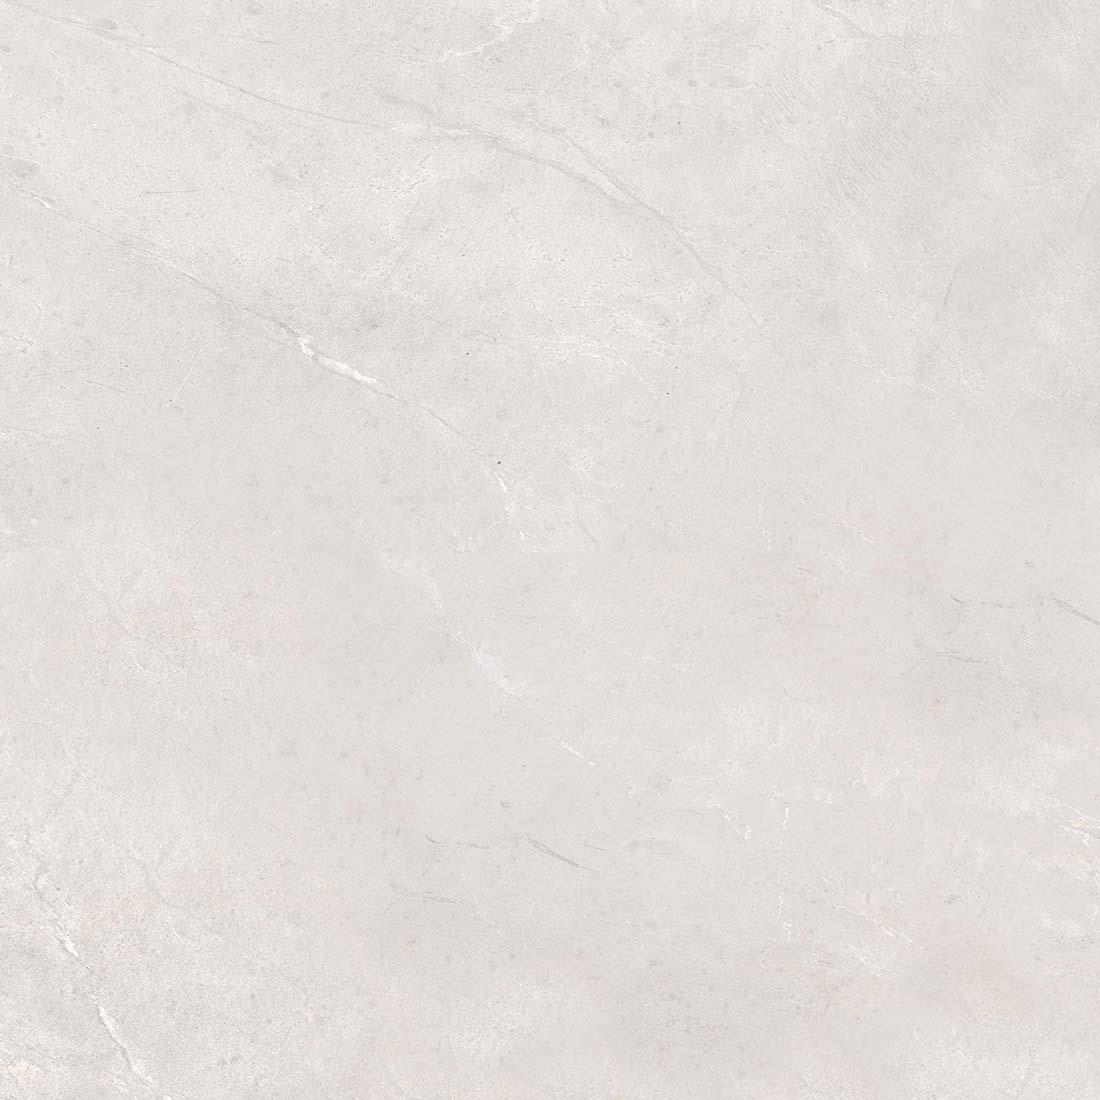 Mist 42x42 Light Grey 1